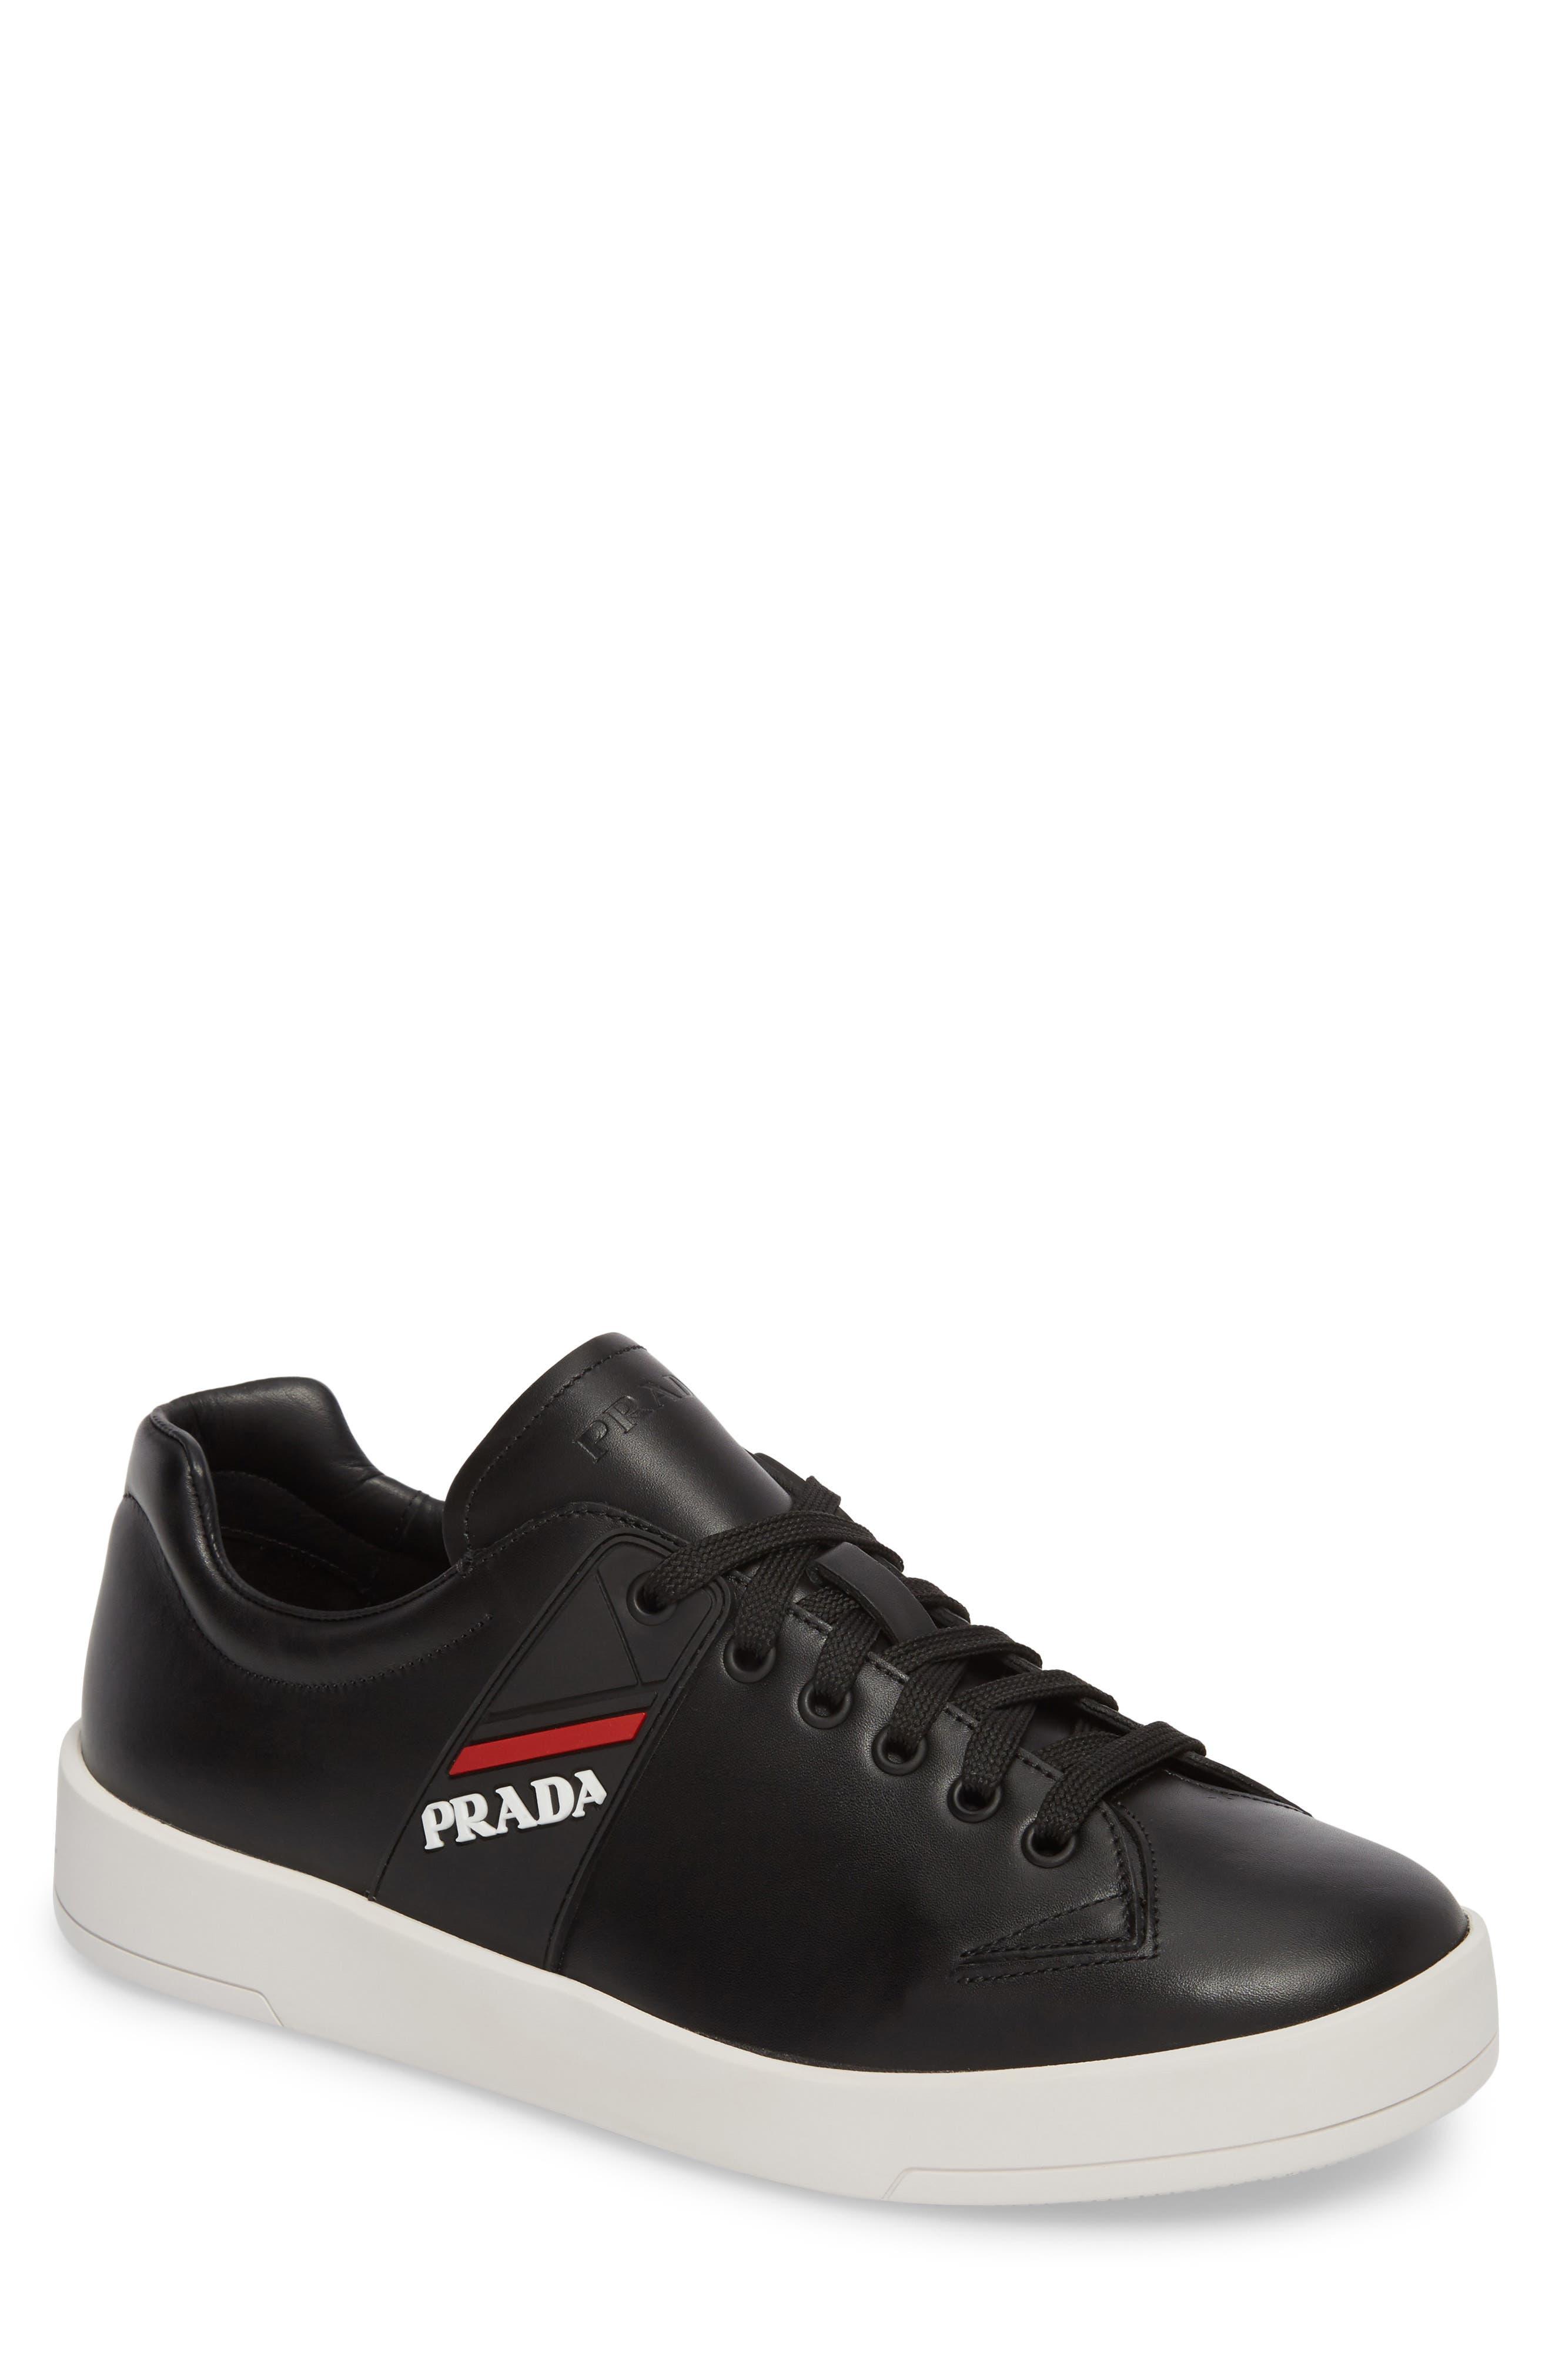 Linea Rossa Sneaker,                             Main thumbnail 1, color,                             Nero Bianco